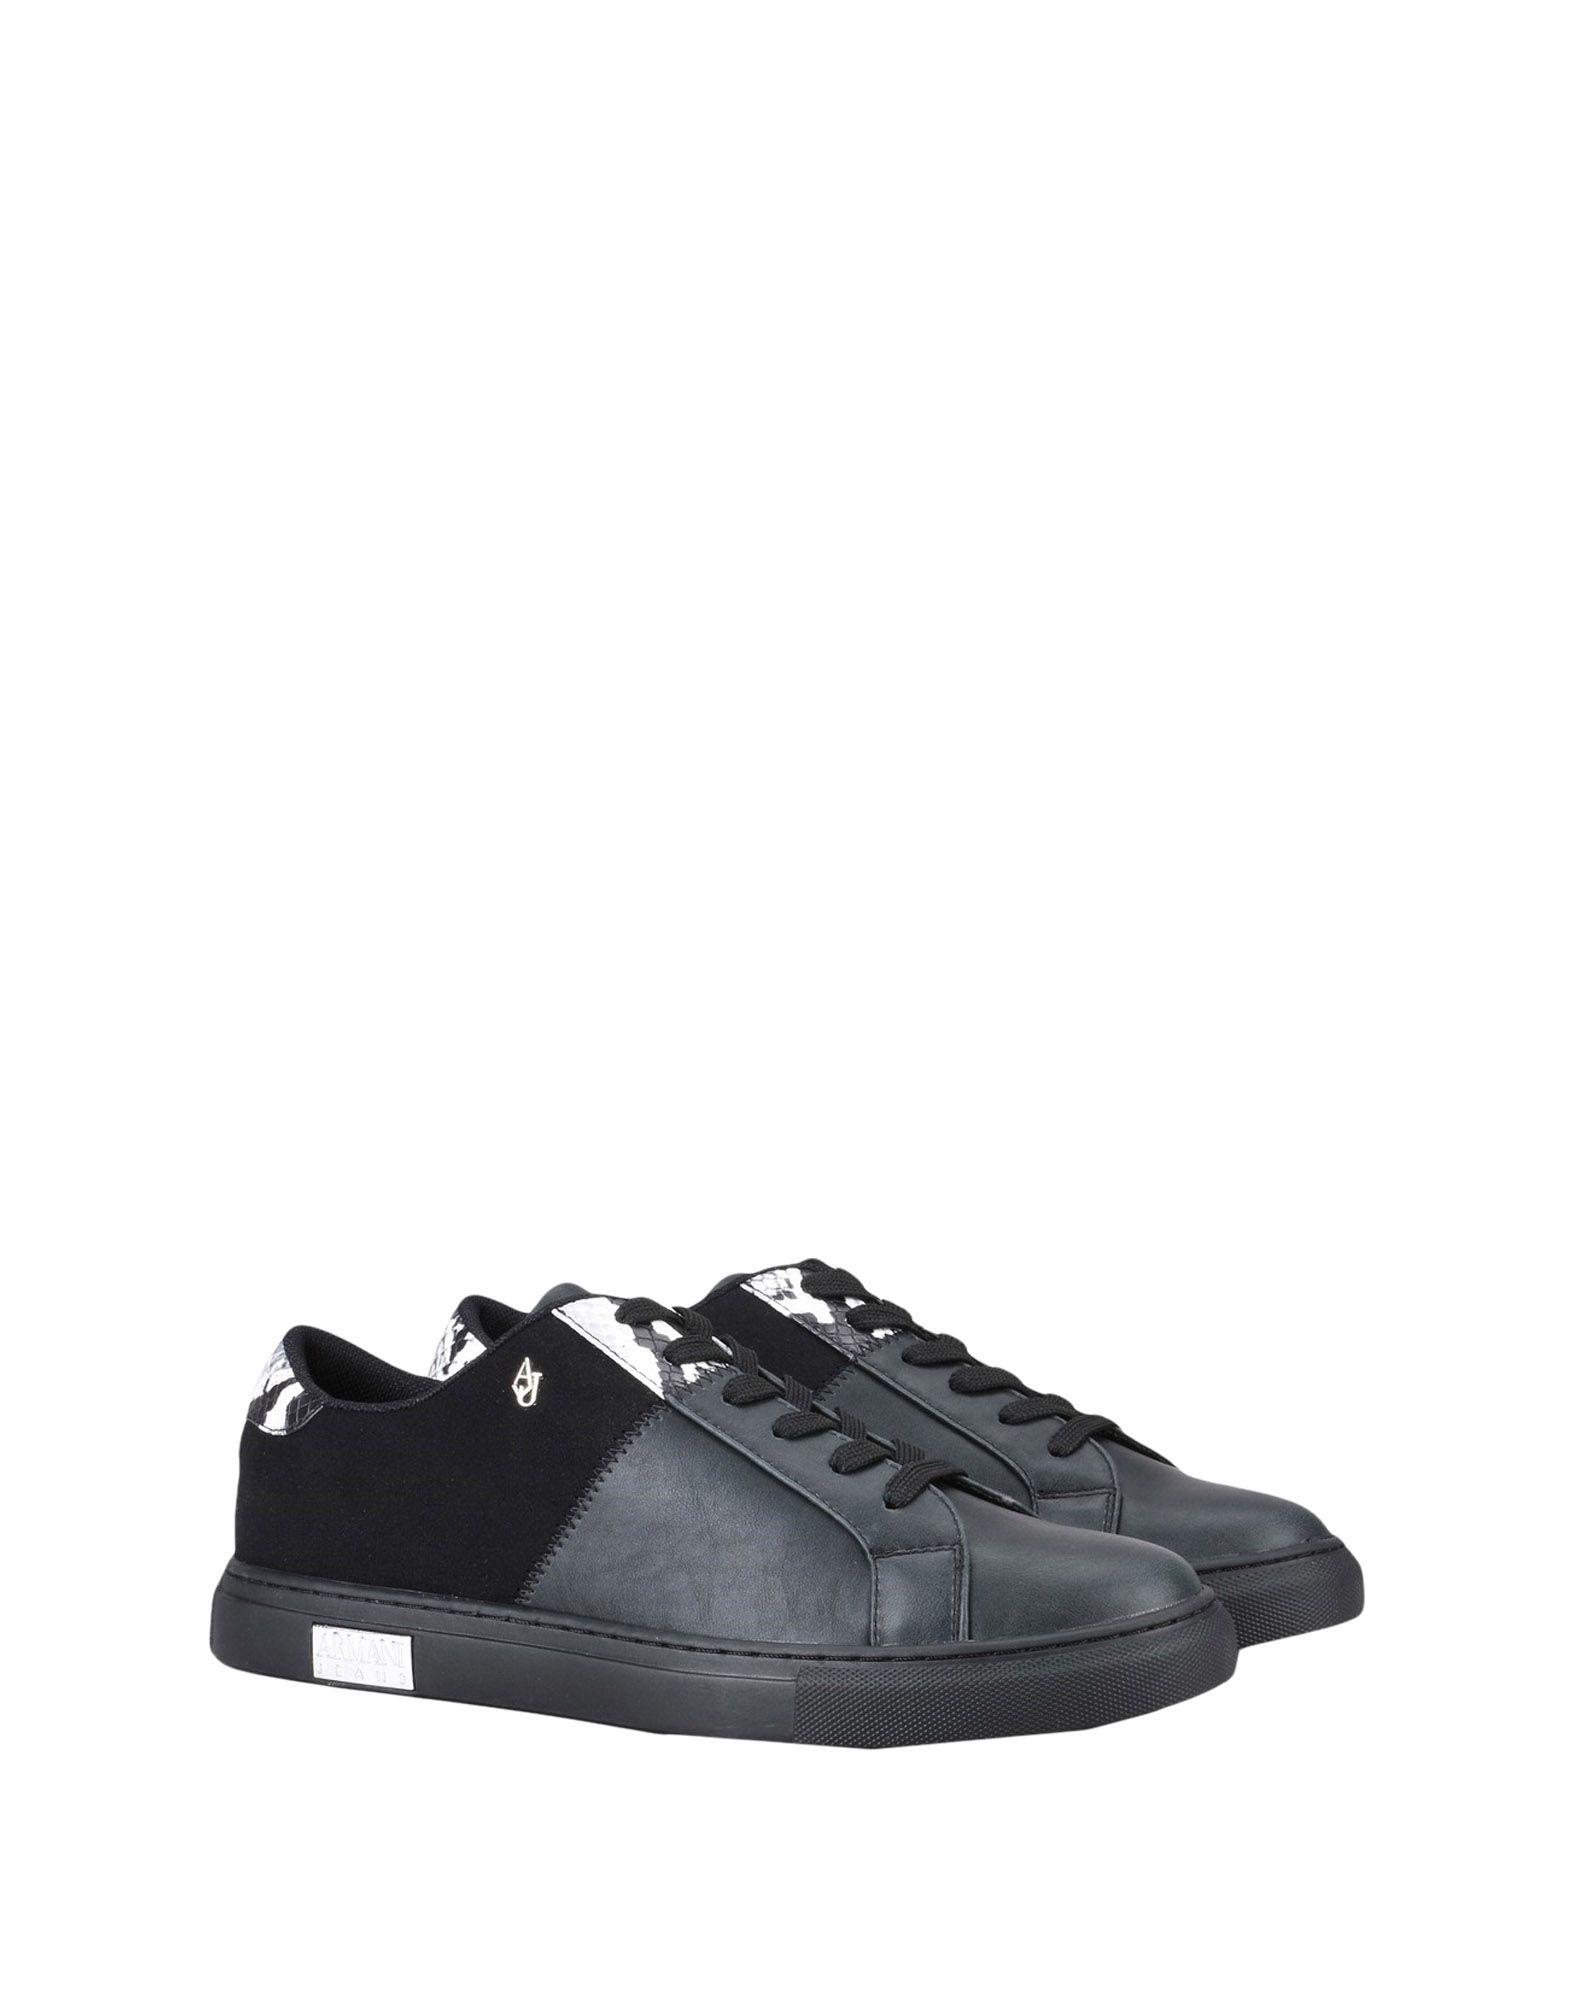 Armani Jeans Sneakers - Women Armani Jeans Sneakers Kingdom online on  United Kingdom Sneakers - 11560163MJ 63c367